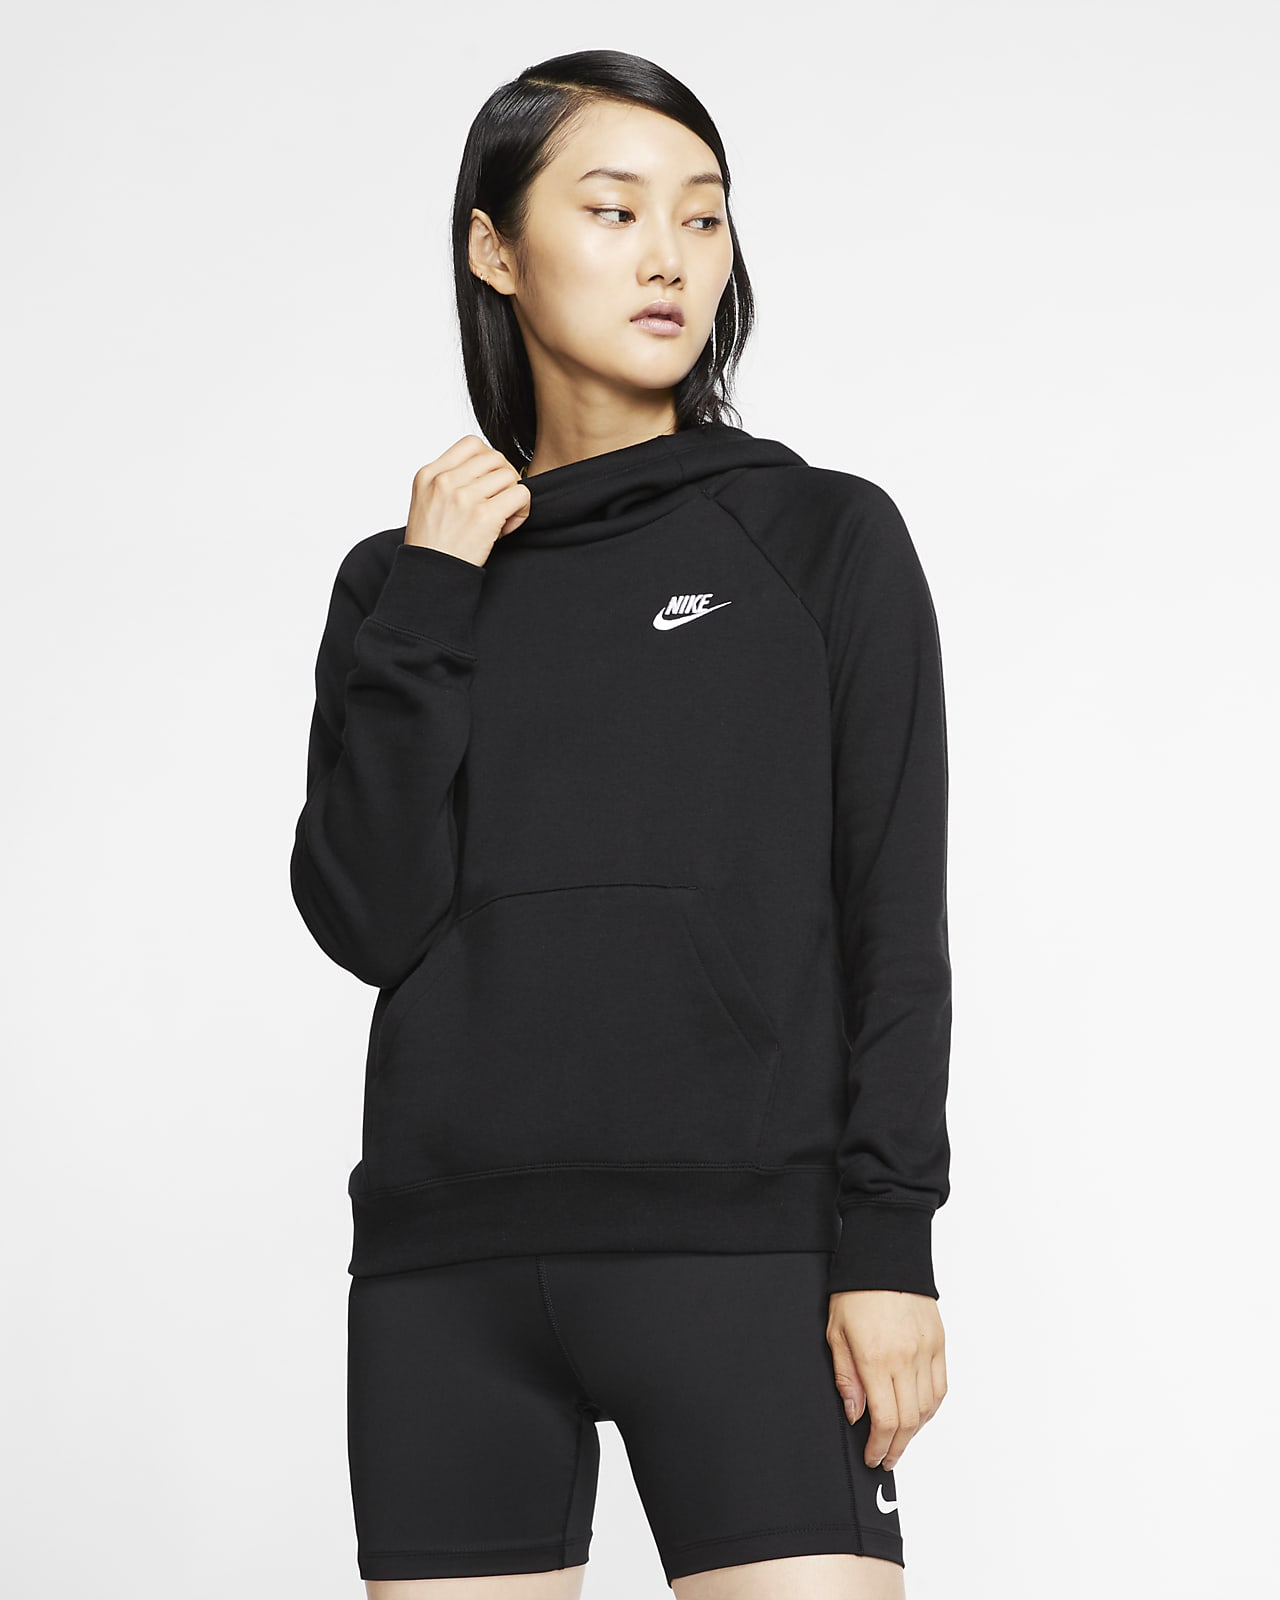 Hoodie pullover de lã cardada com gola afunilada Nike Sportswear Essential para mulher